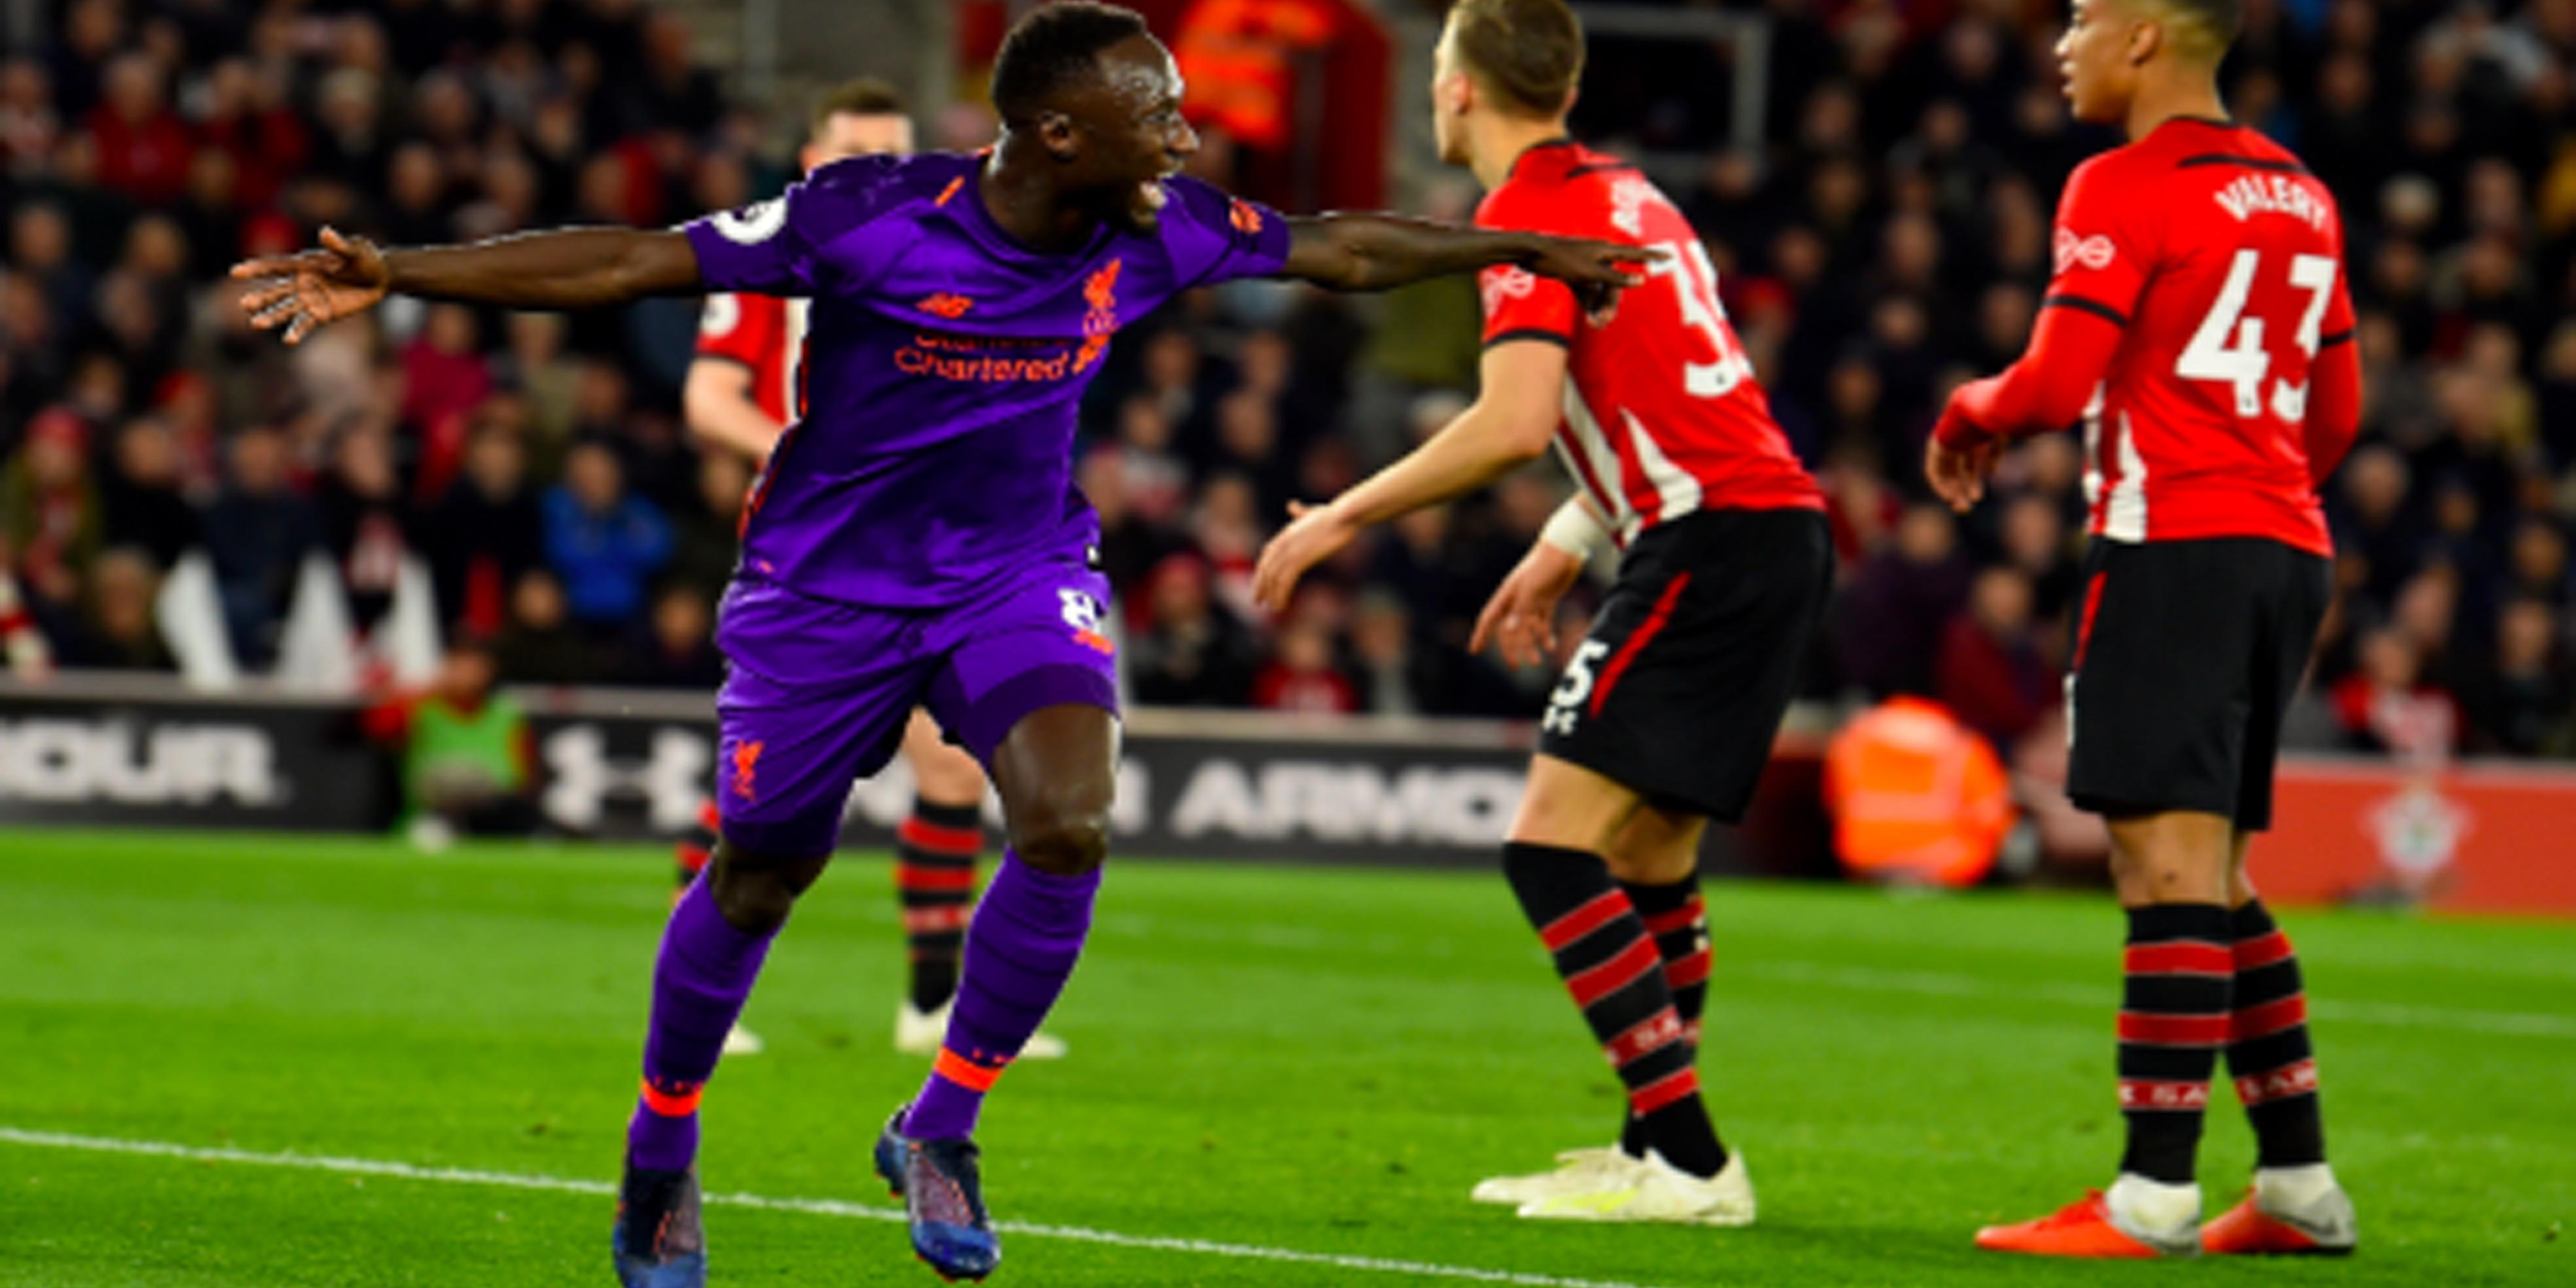 Liverpool : Naby Keita (enfin) buteur !